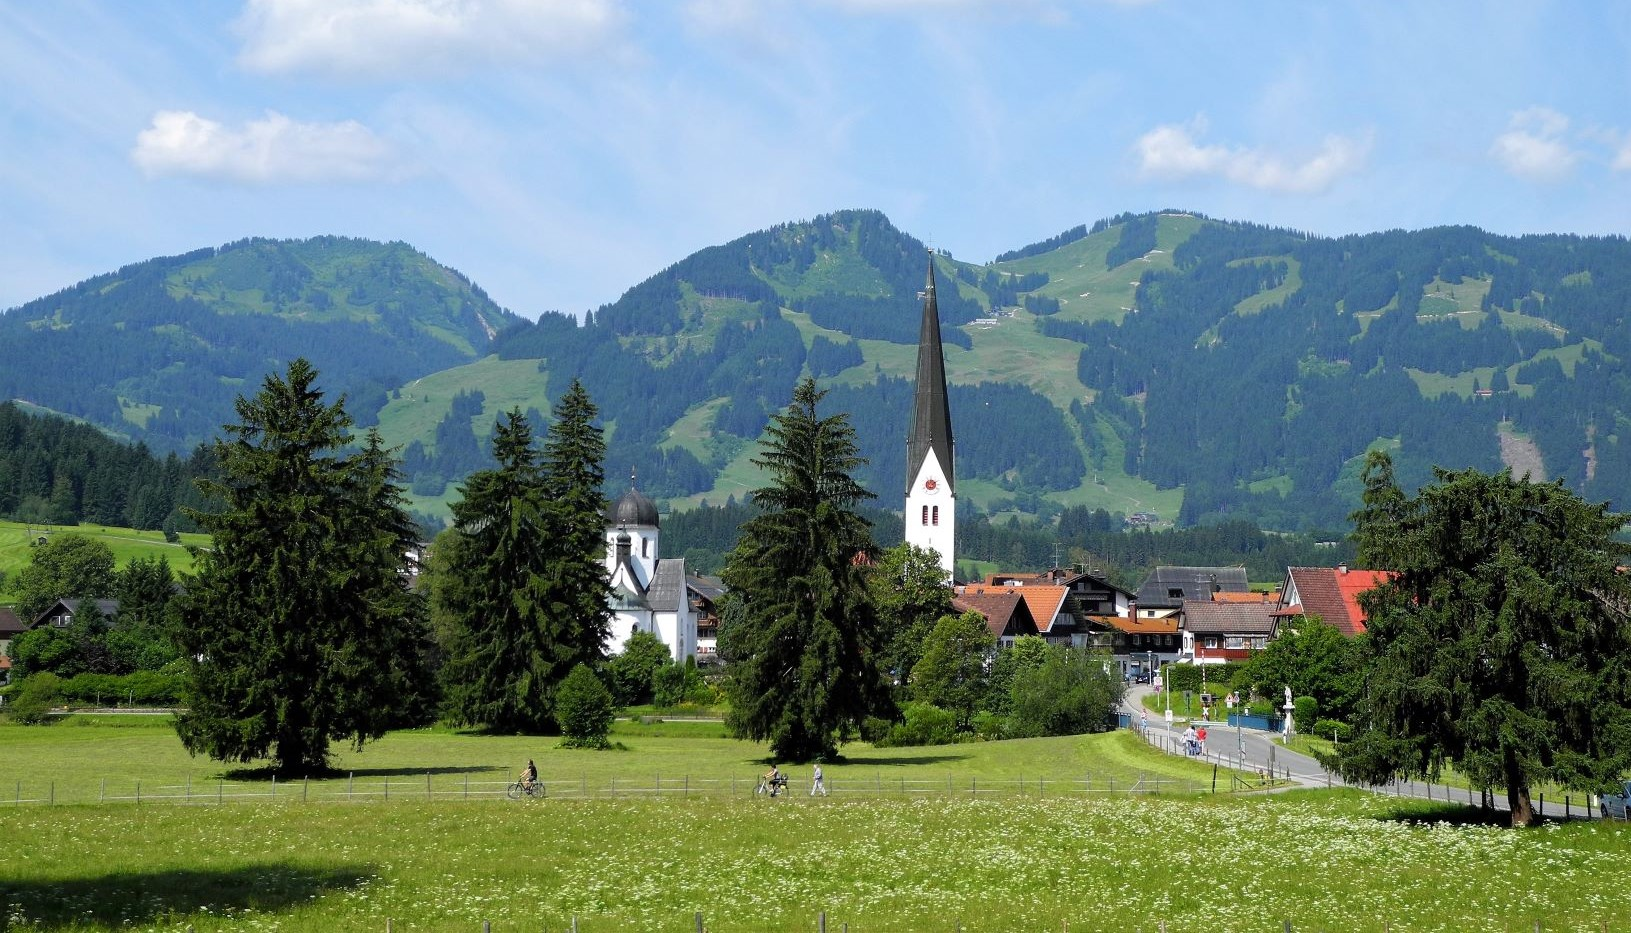 Etappe 52: Oberstdorf – Gunzesried